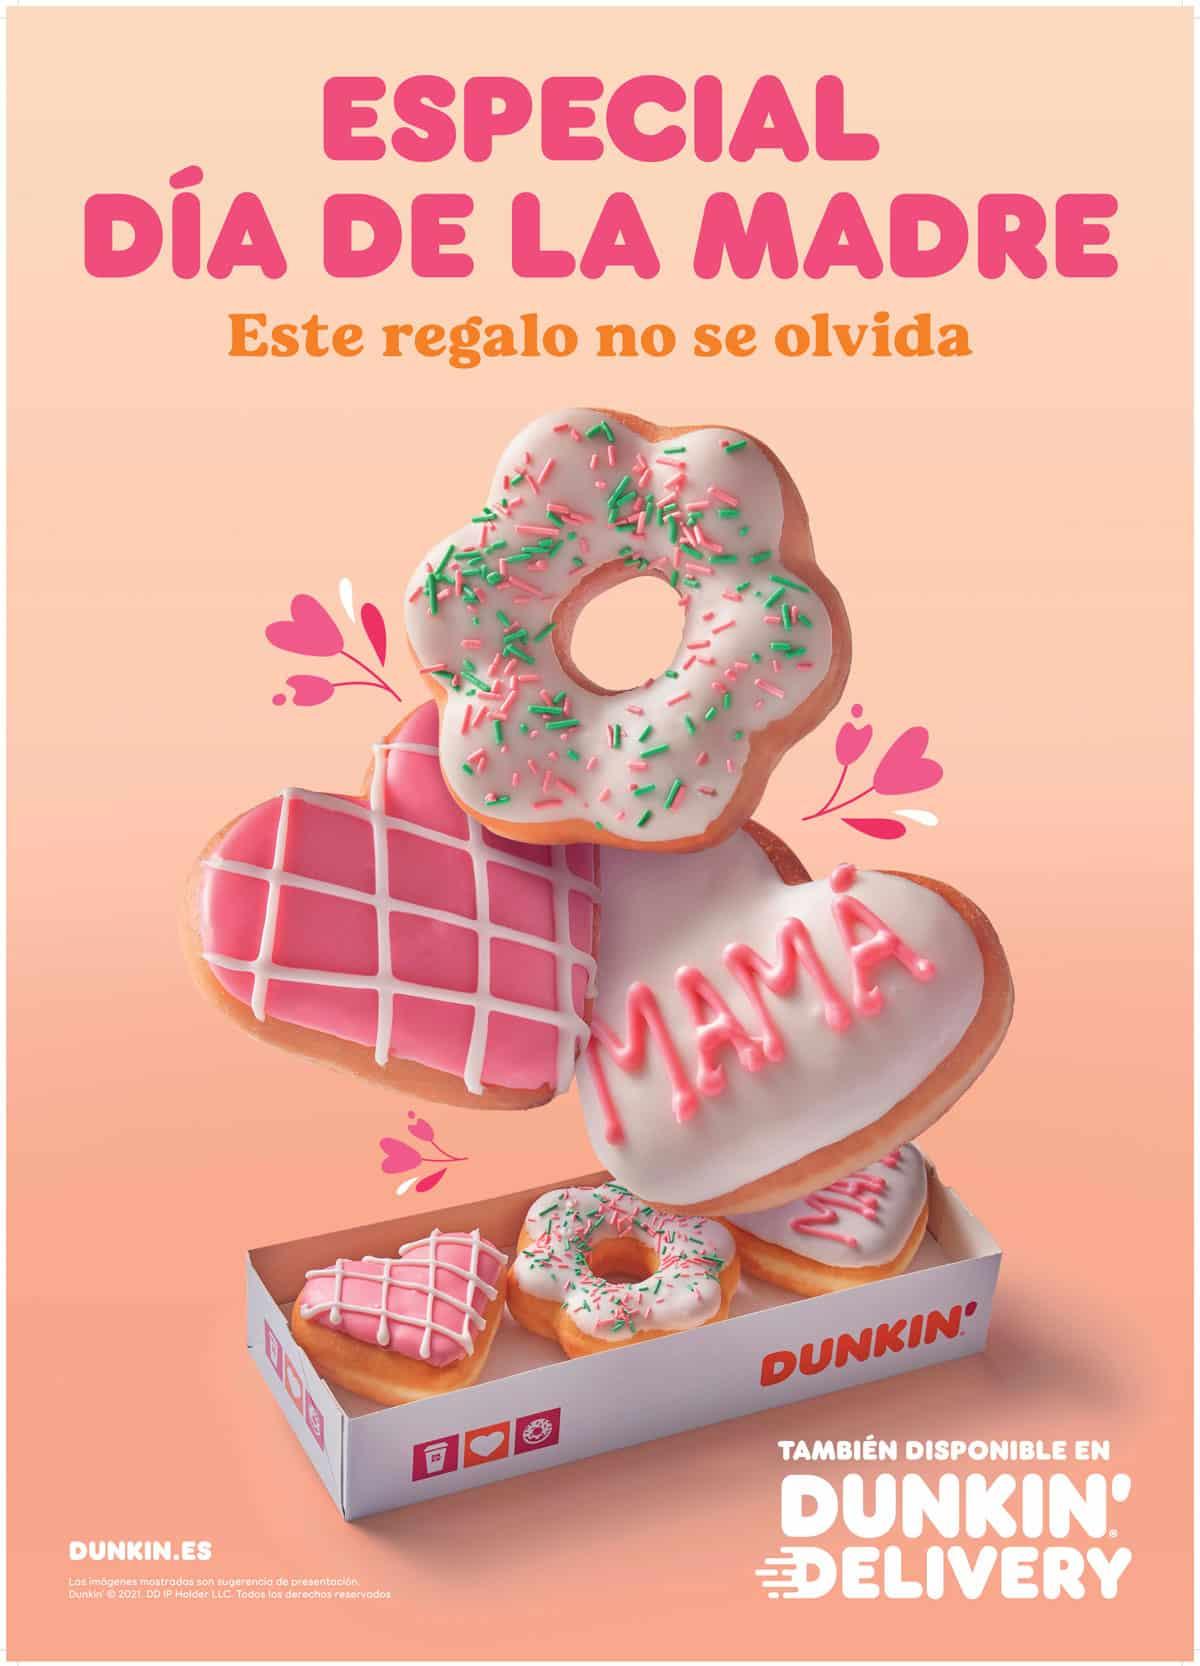 Dunkin Día de la Madre